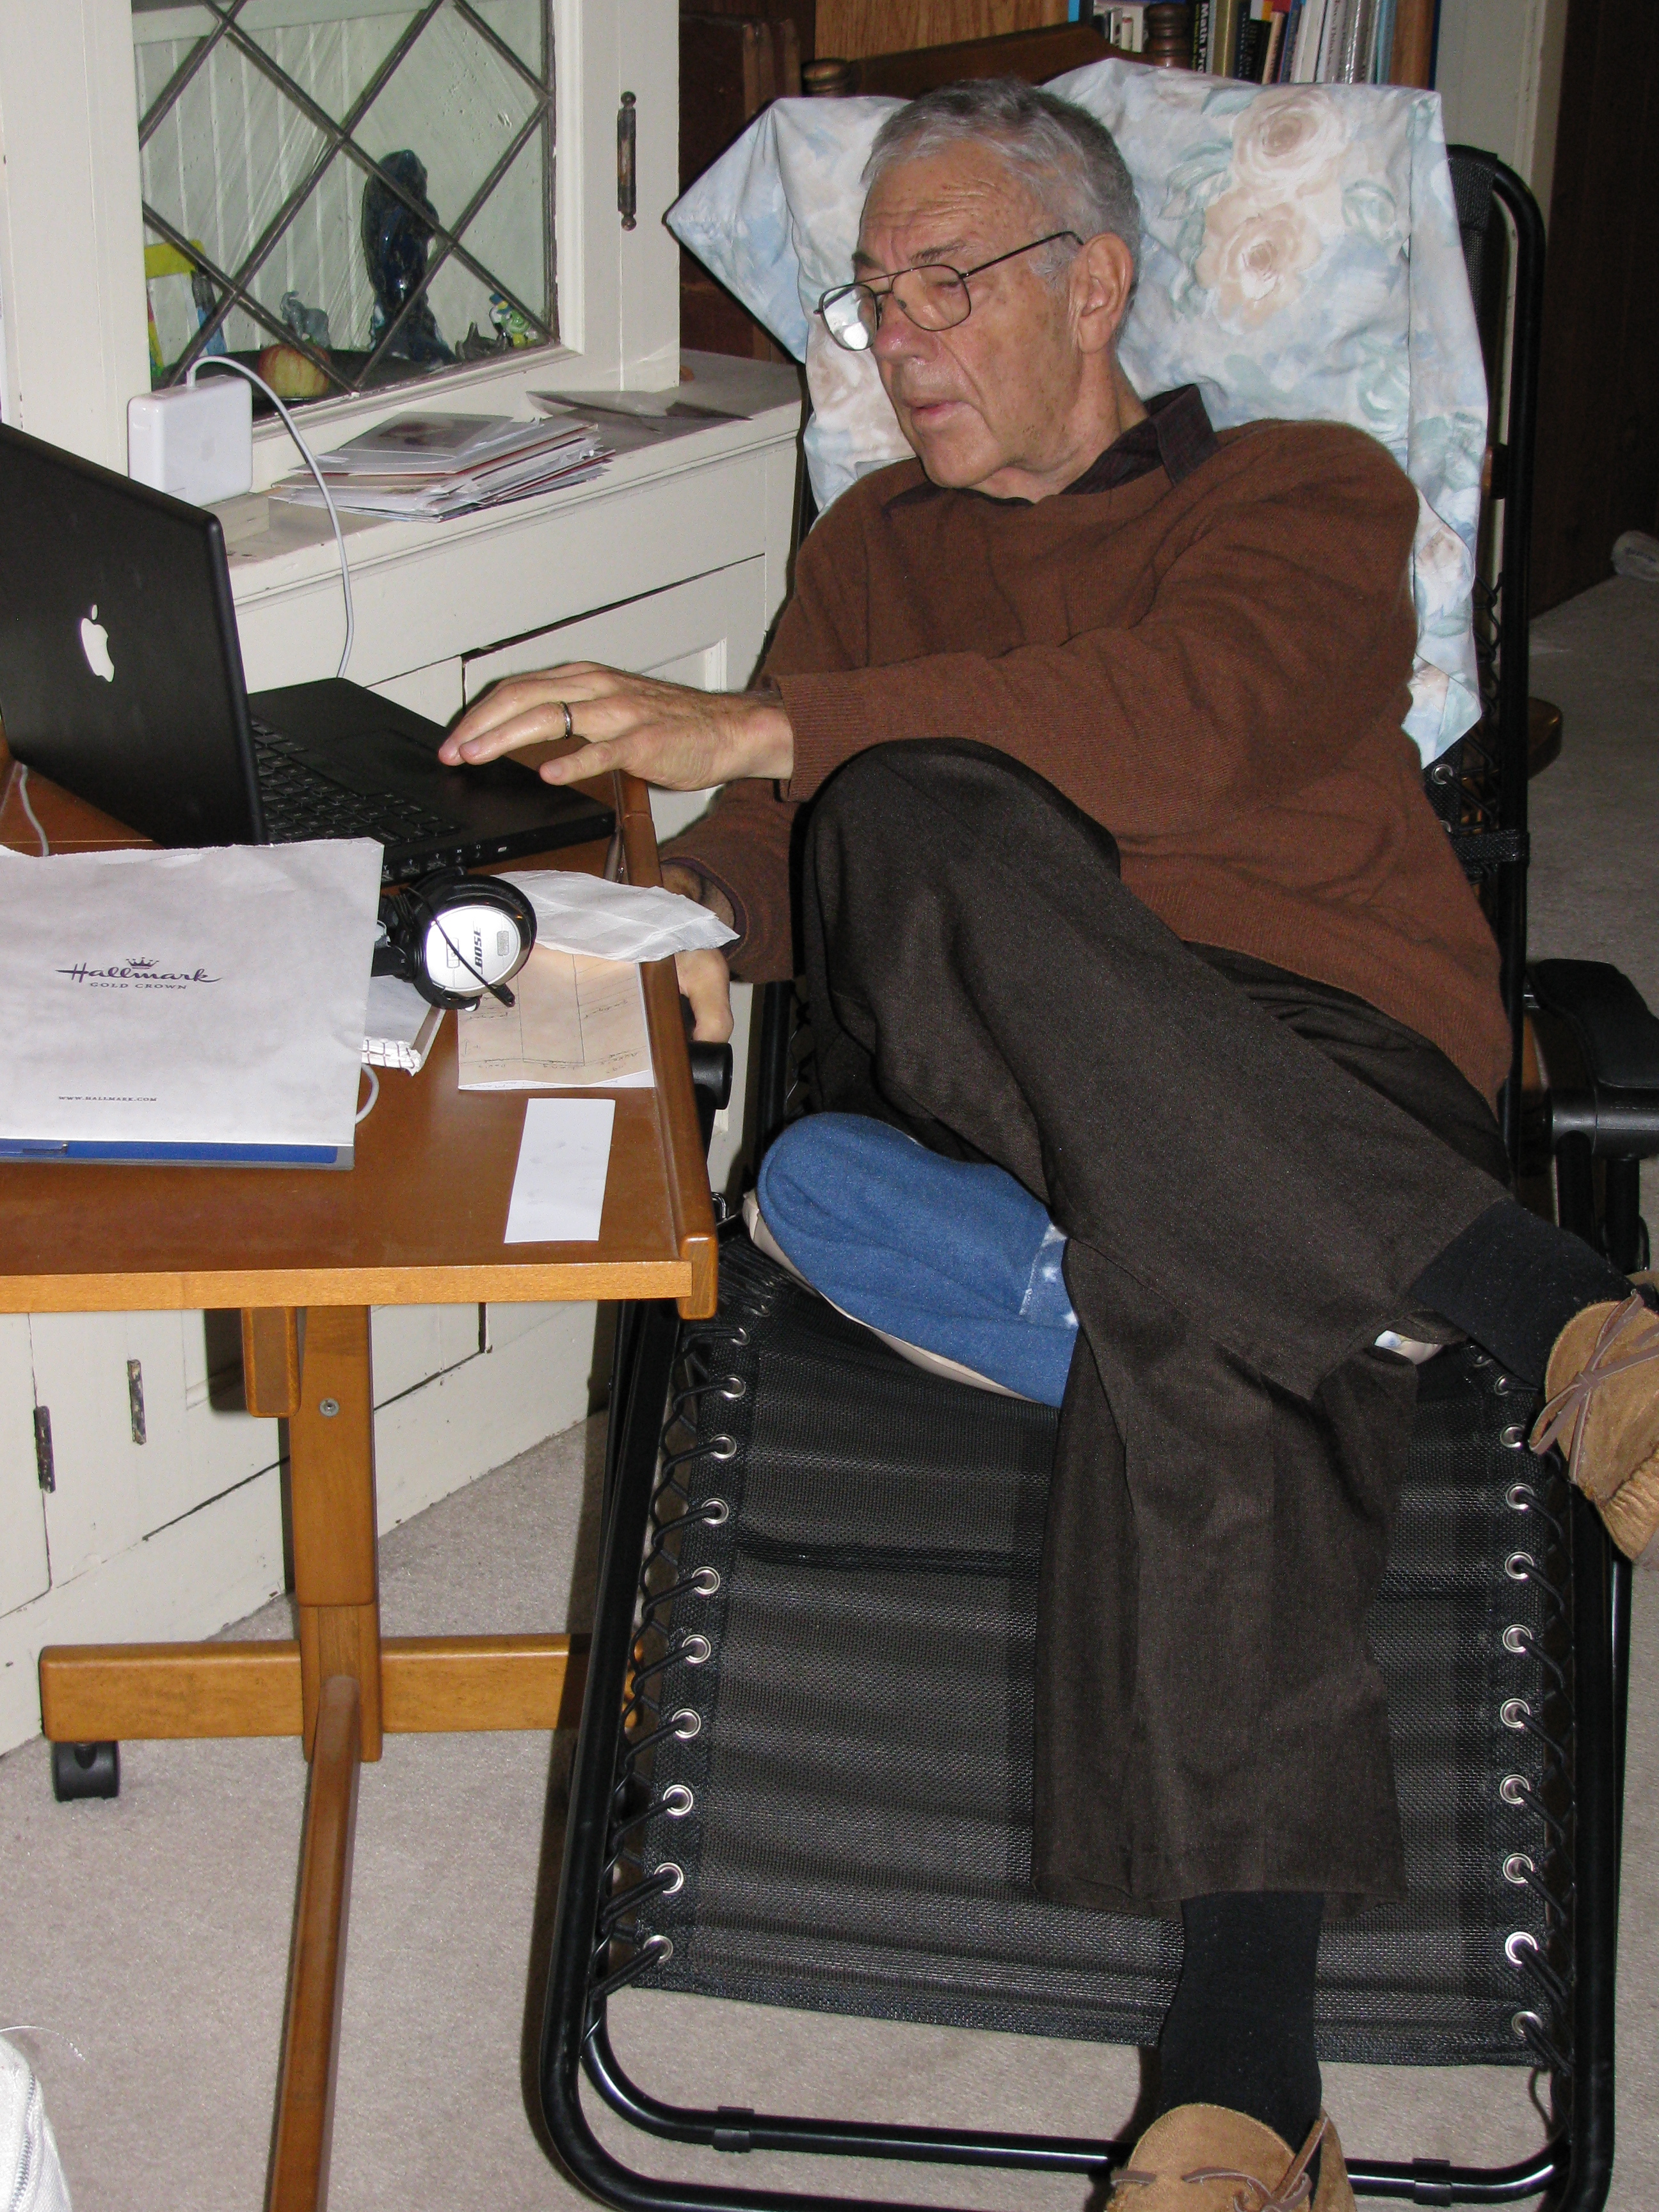 Dan's recliner & workstation at home